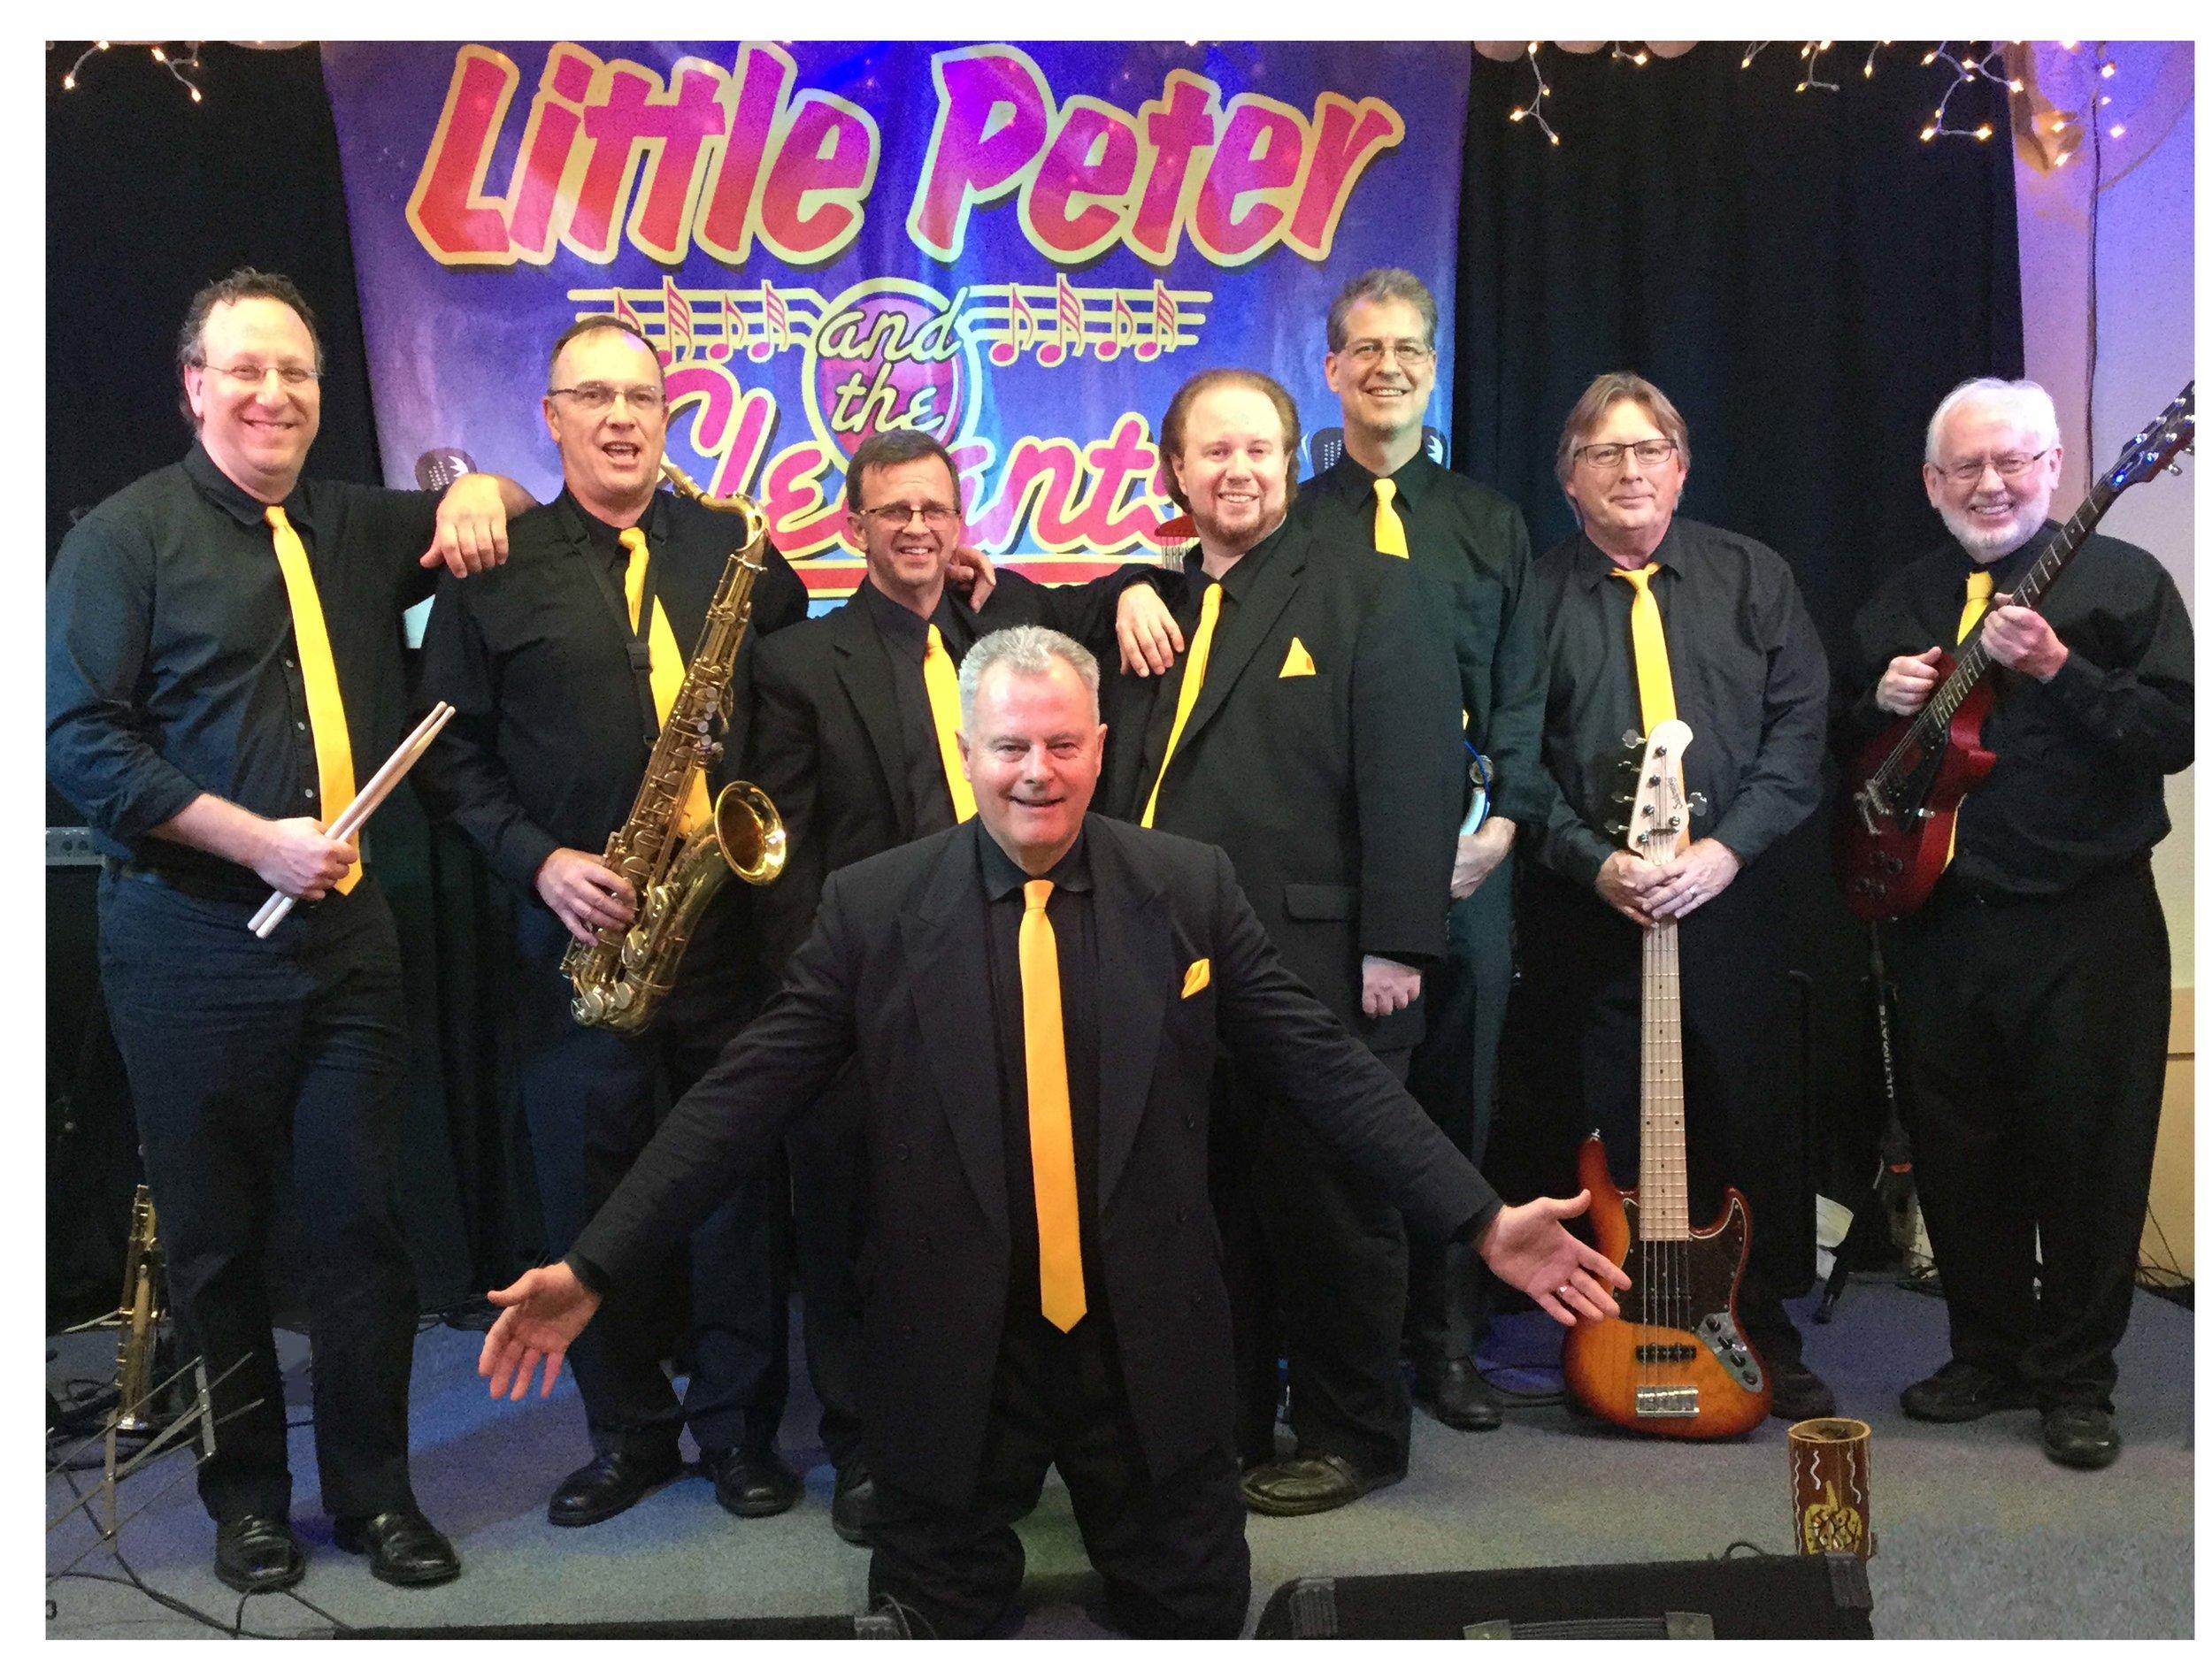 Little Peter & the Elegants